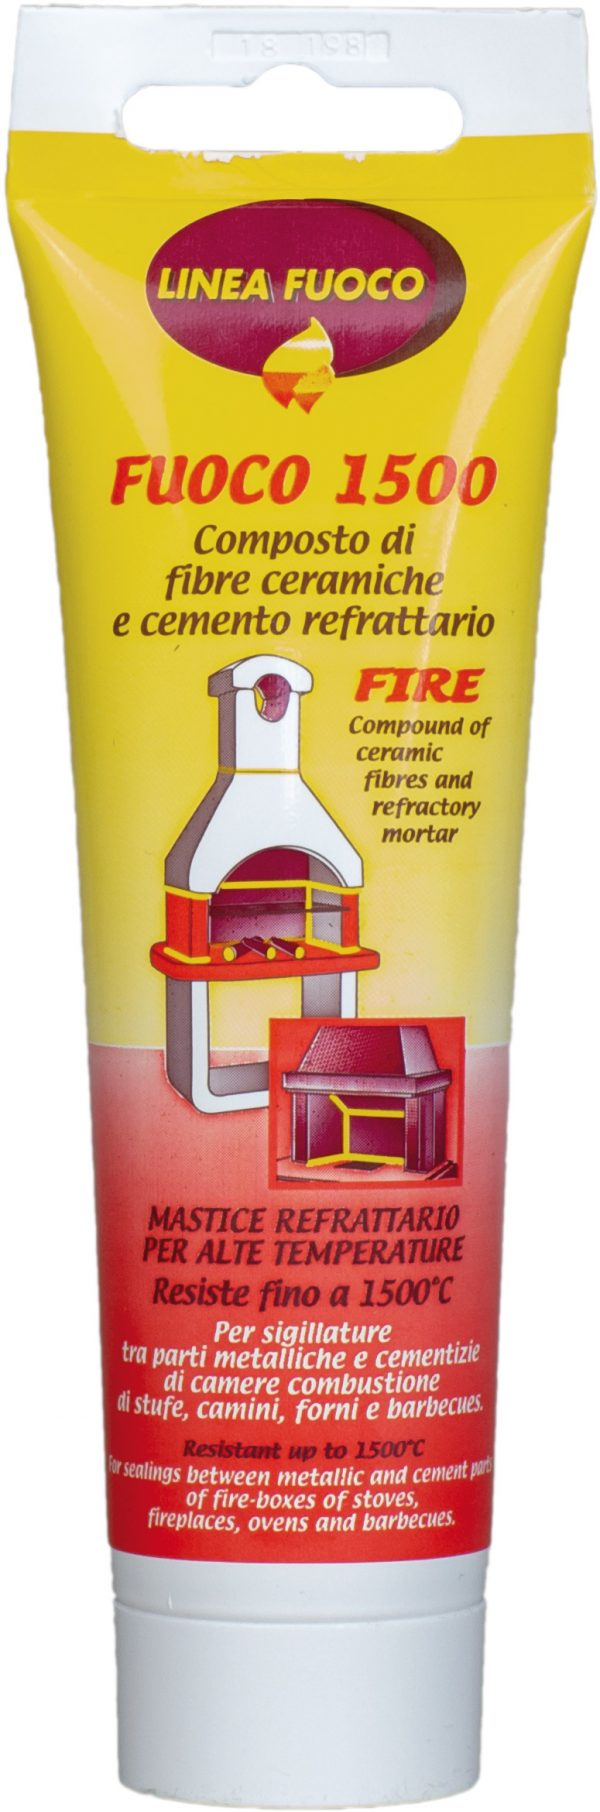 Ceramic-fibre and fire-proof cement compound